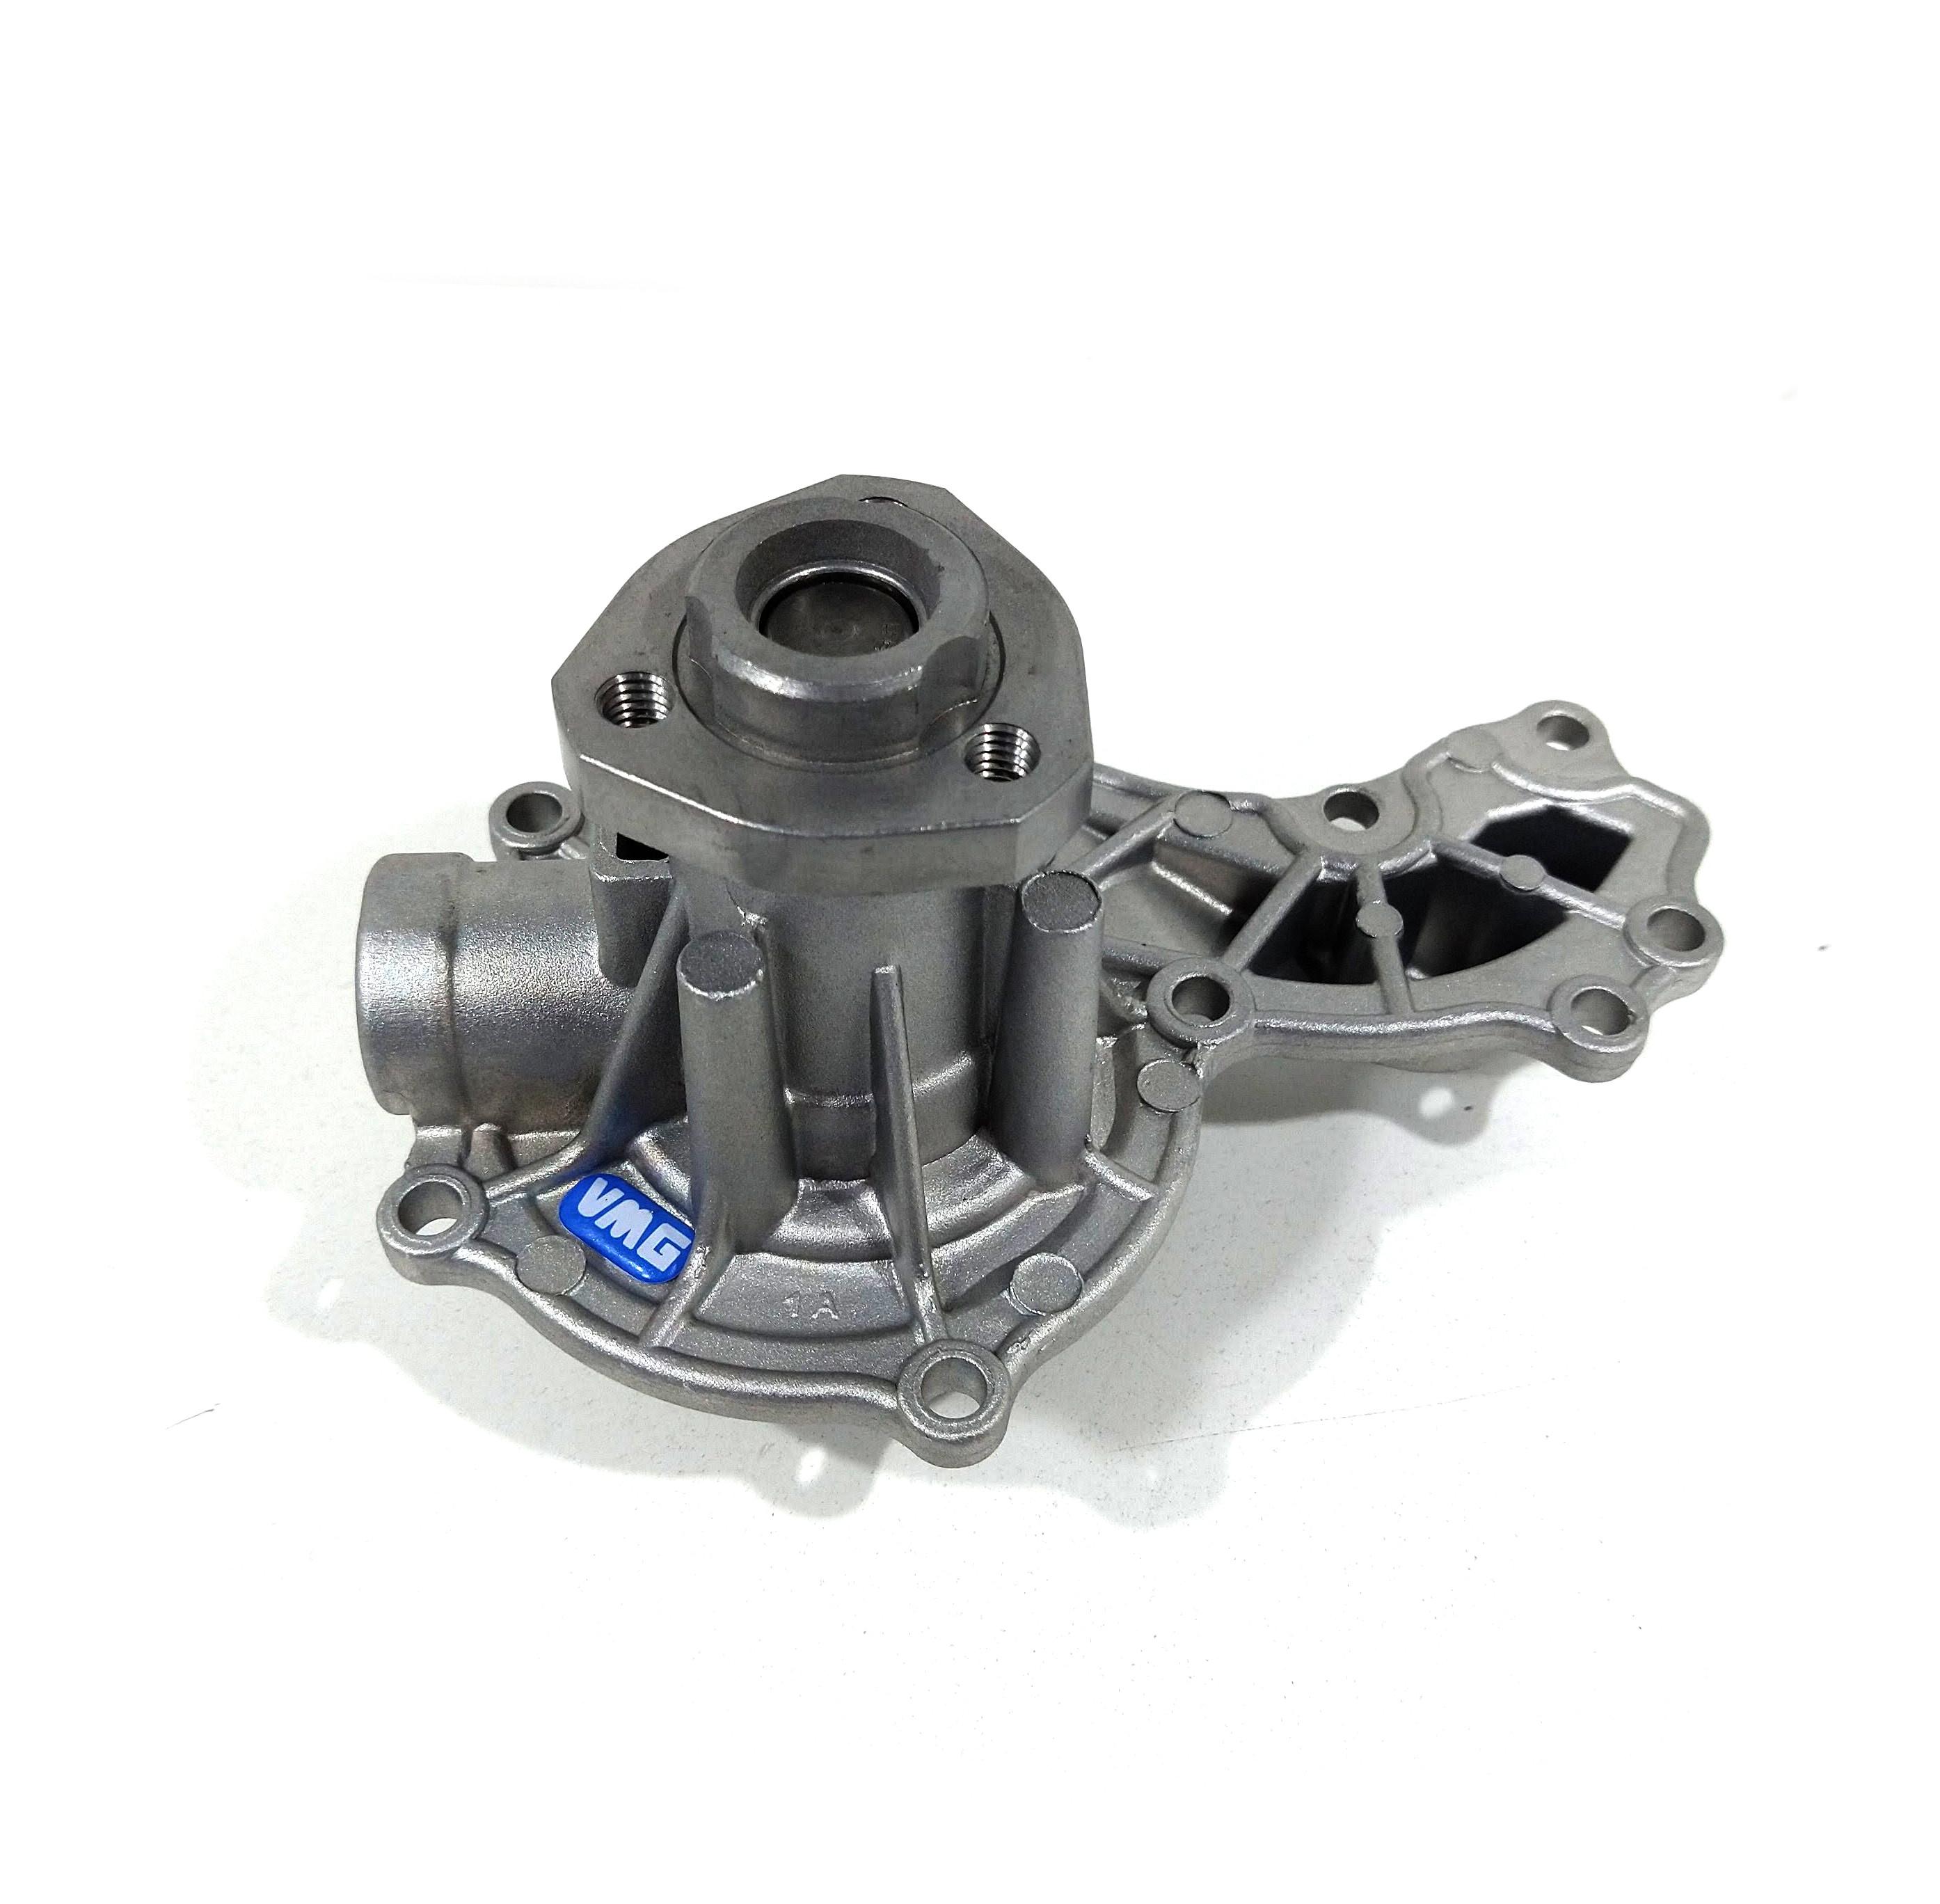 Bomba de agua Volkswagen Polo Classic 1.6 1.8 MI Gol 1.9D 1.6 MI Gacel 1.8 GL